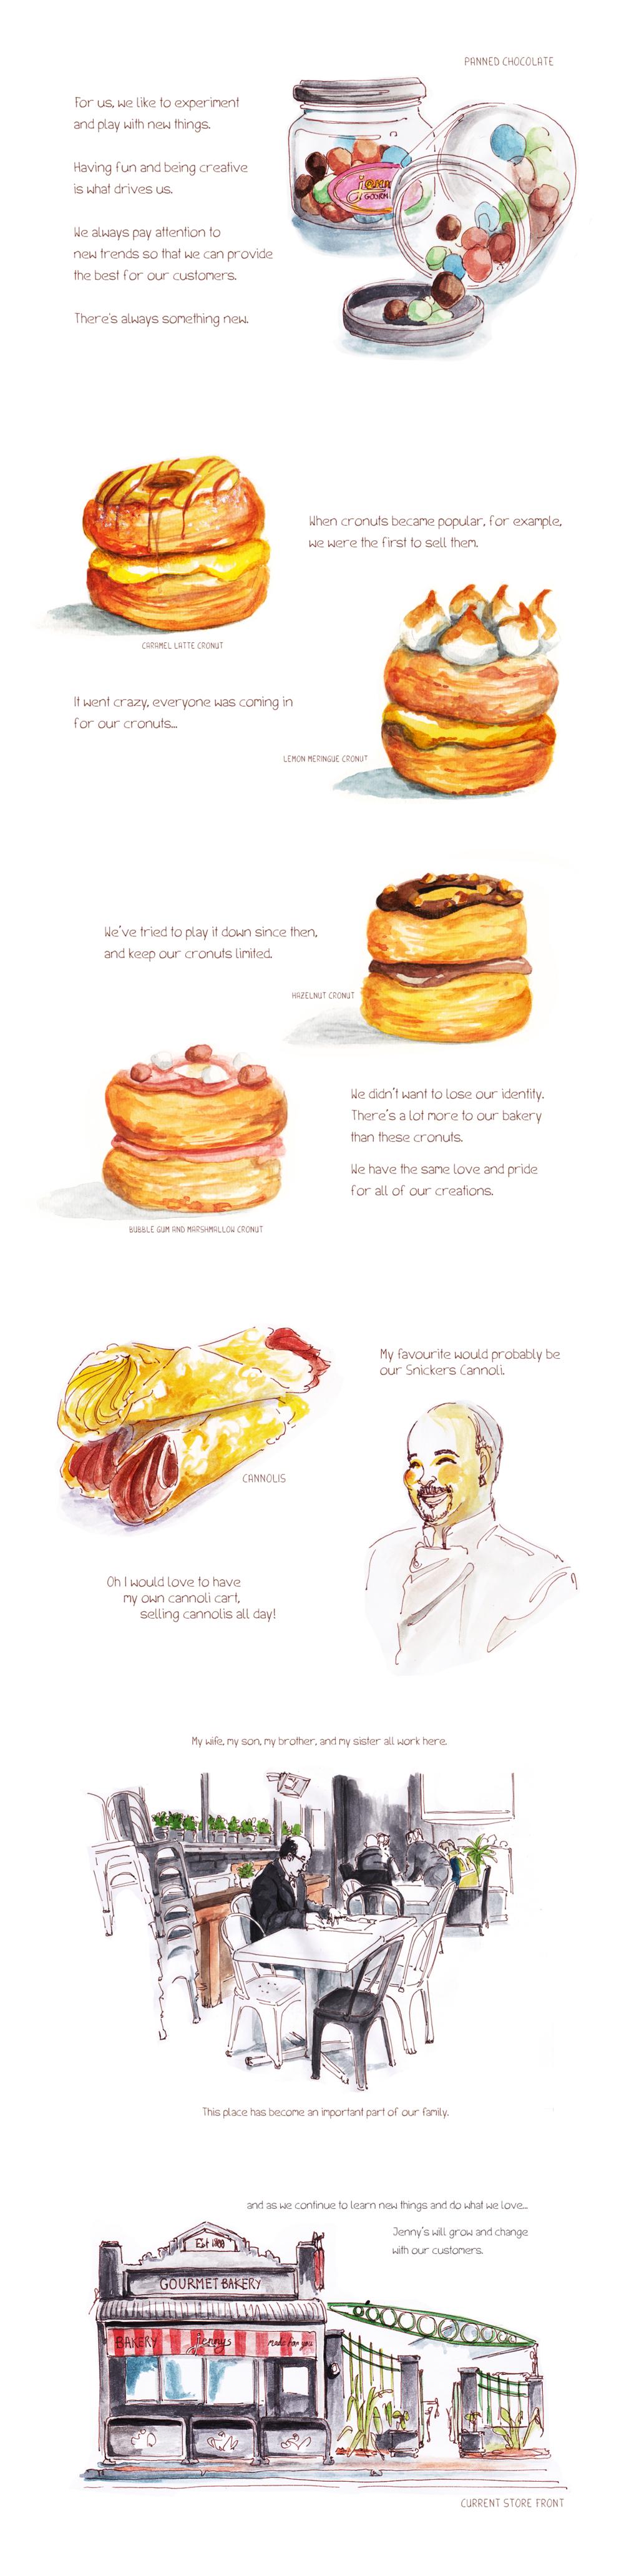 jennys-gourmet-bakery-elaine-cheng-interview-2.jpg